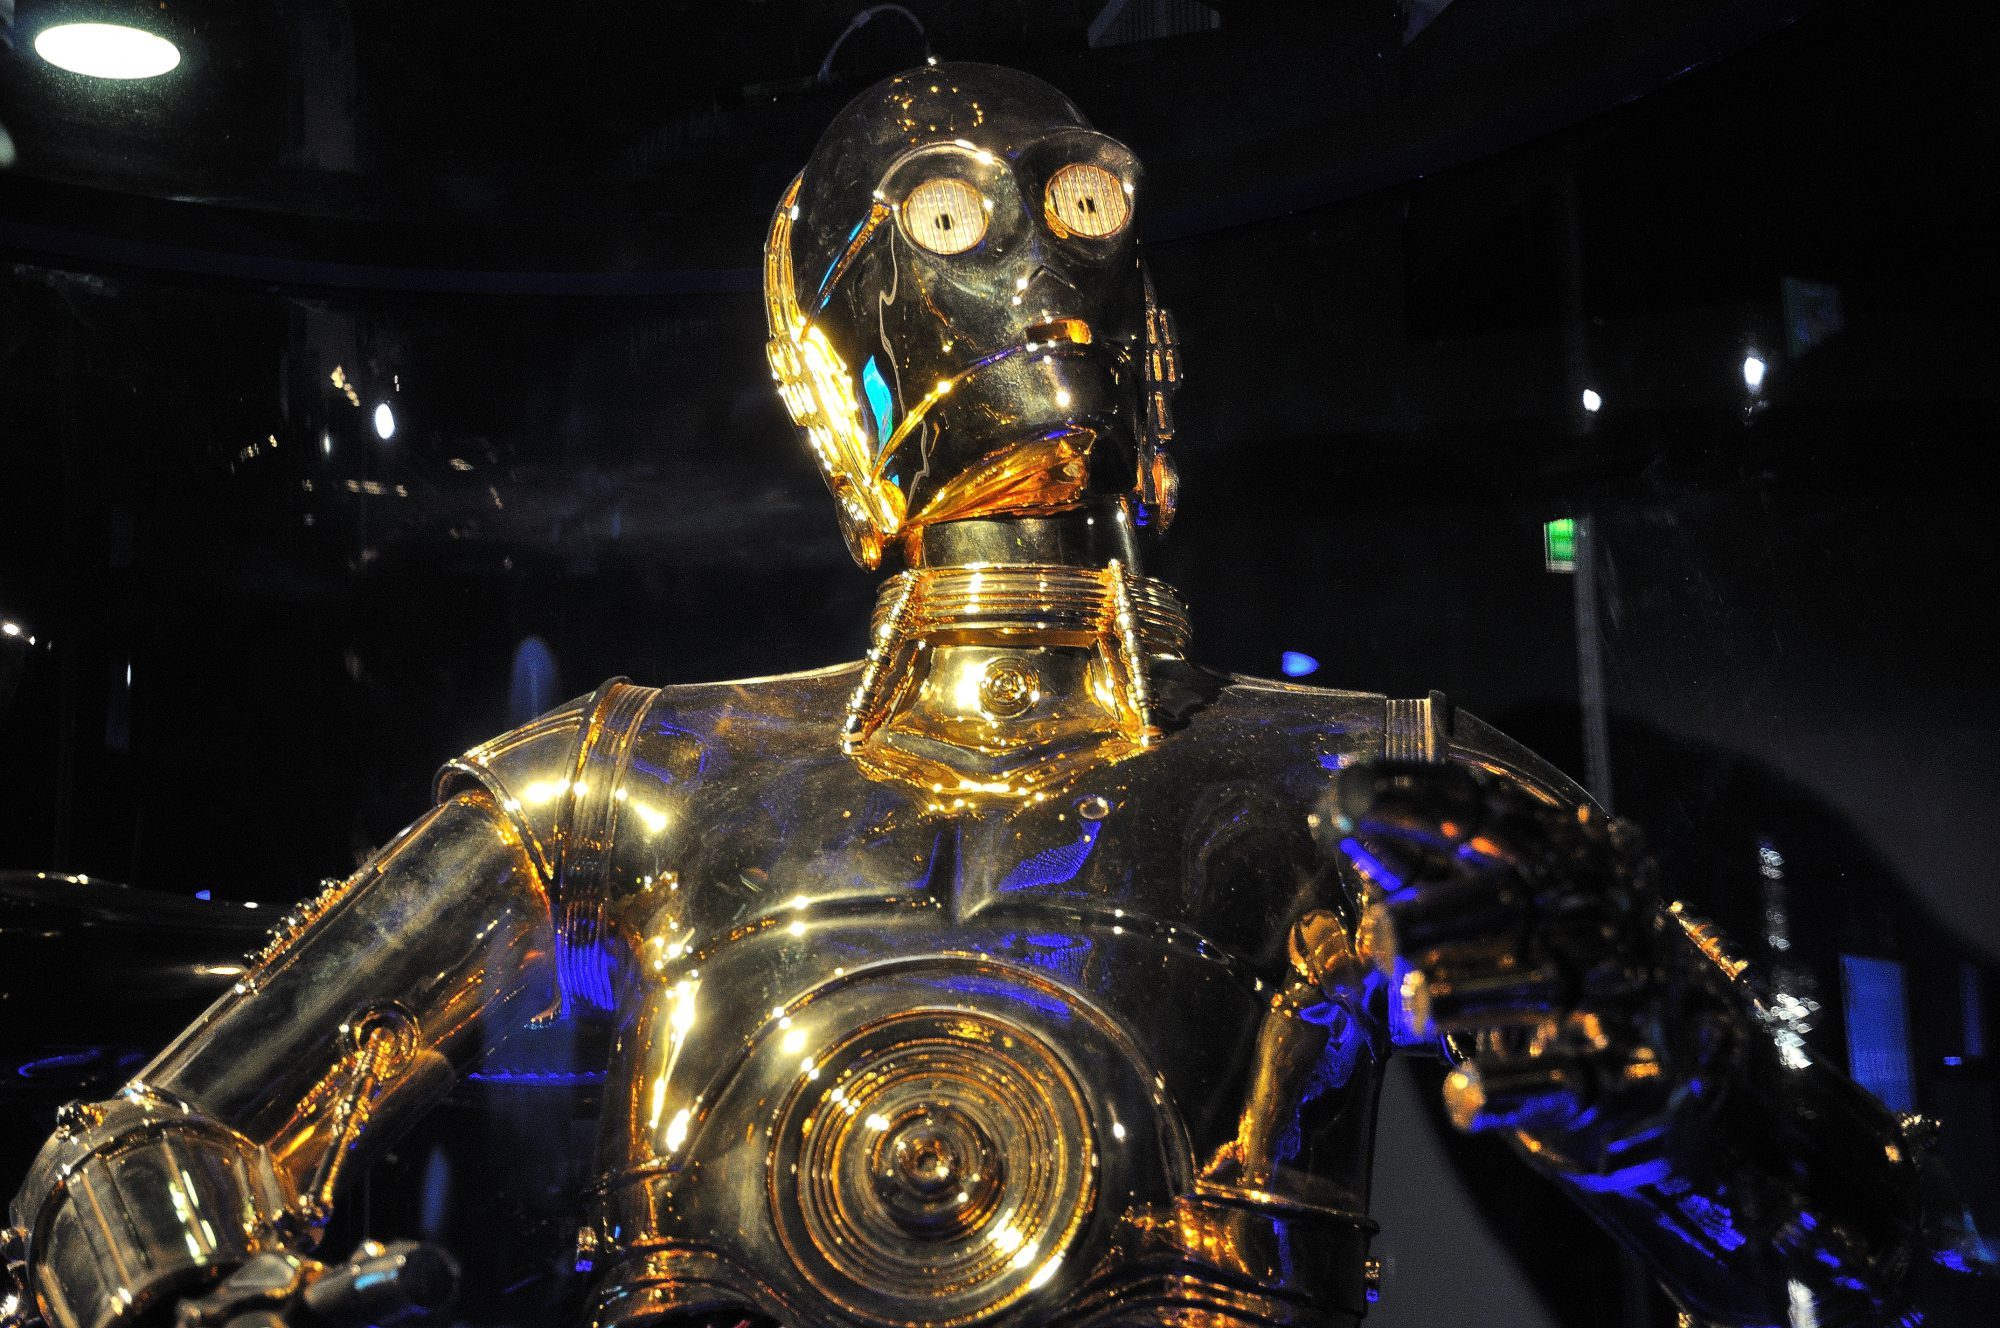 Le droide de protocole C3PO de la saga Star Wars